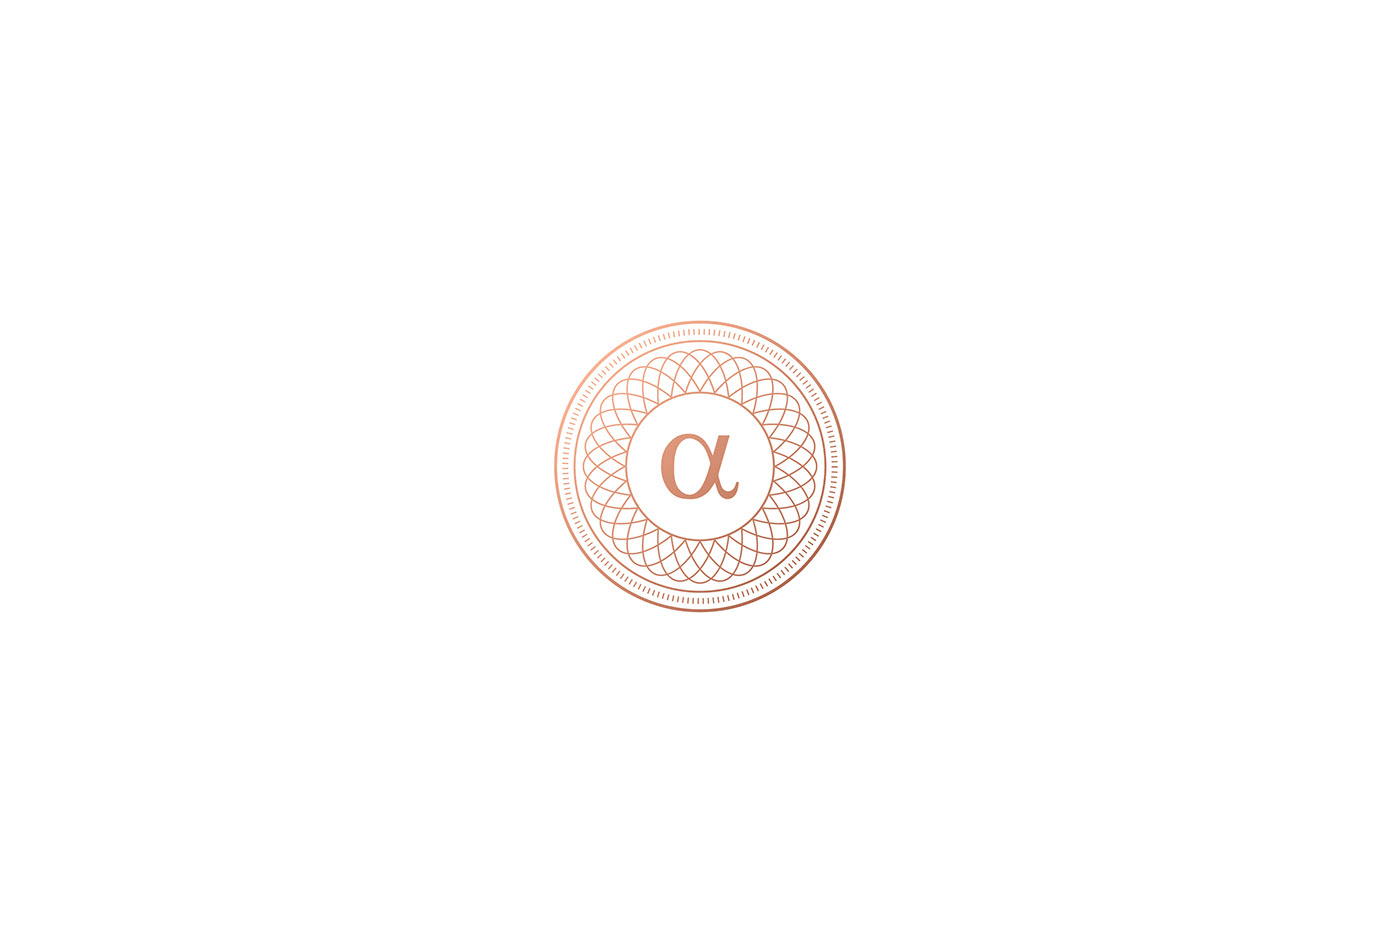 Daniel Lasso徽章w88手机官网平台首页作品欣赏